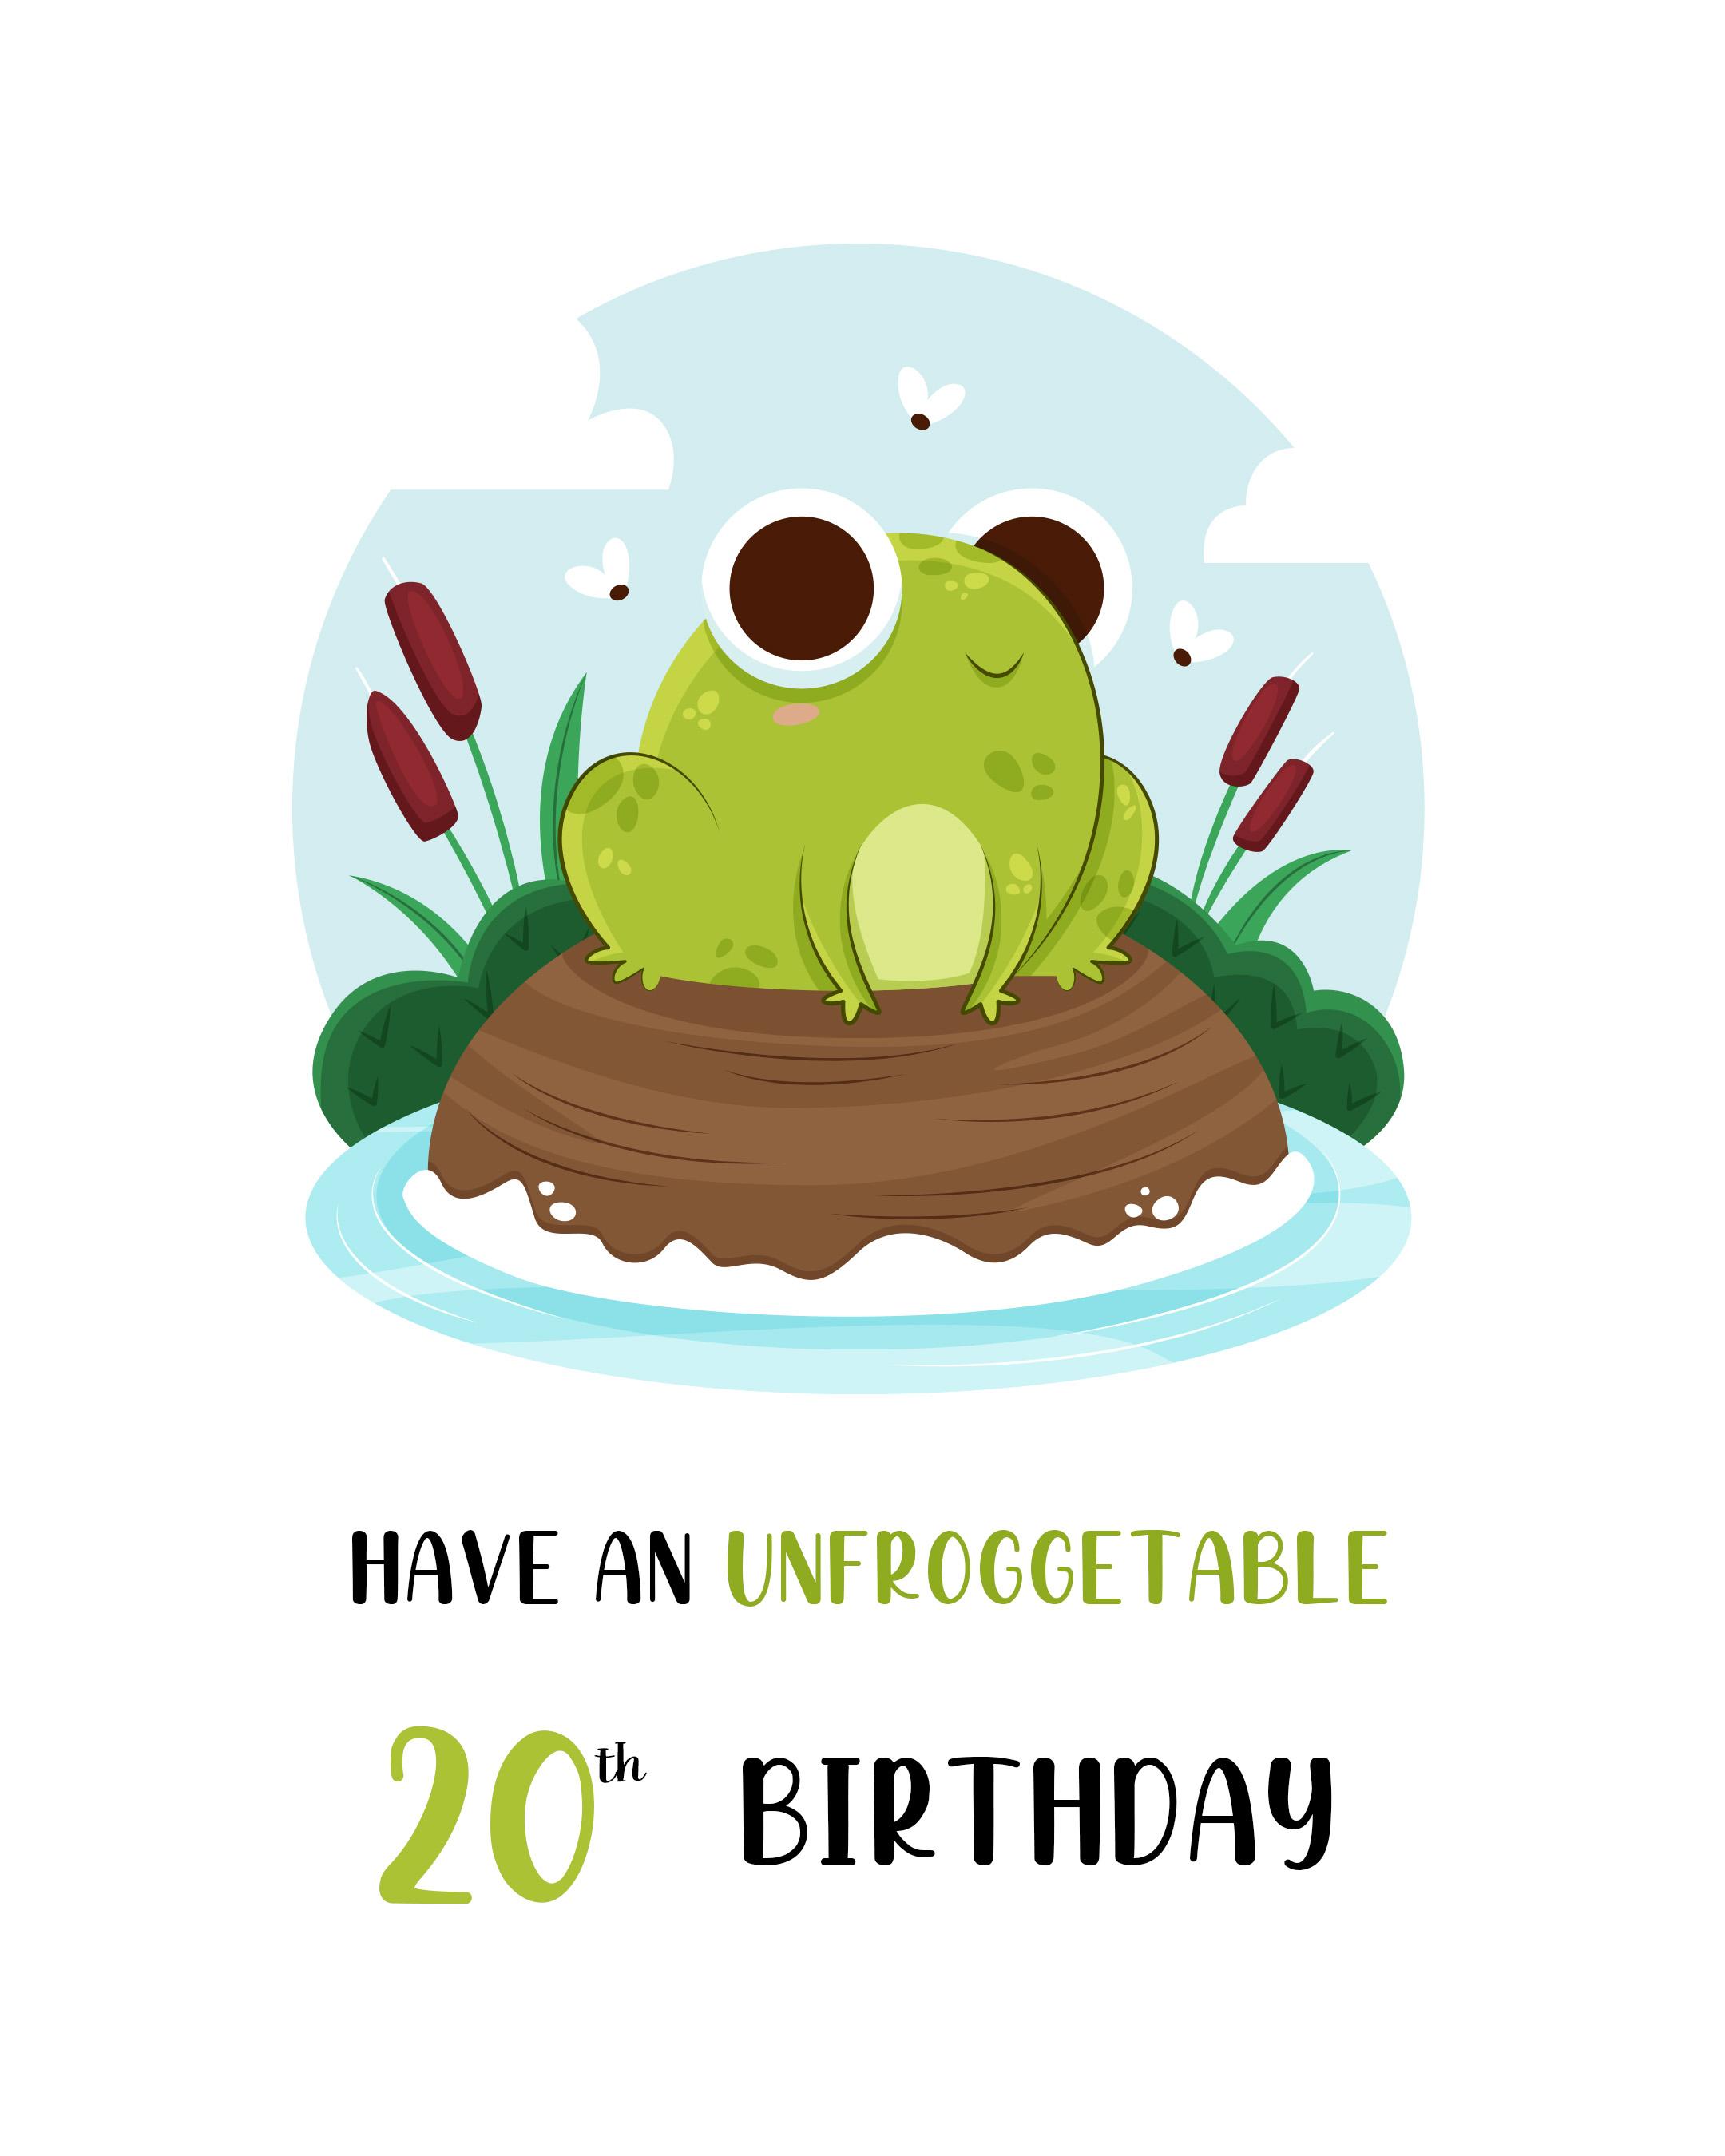 Free Funny 20th Years Happy Birthday Image With Frog - birthdayimg.com